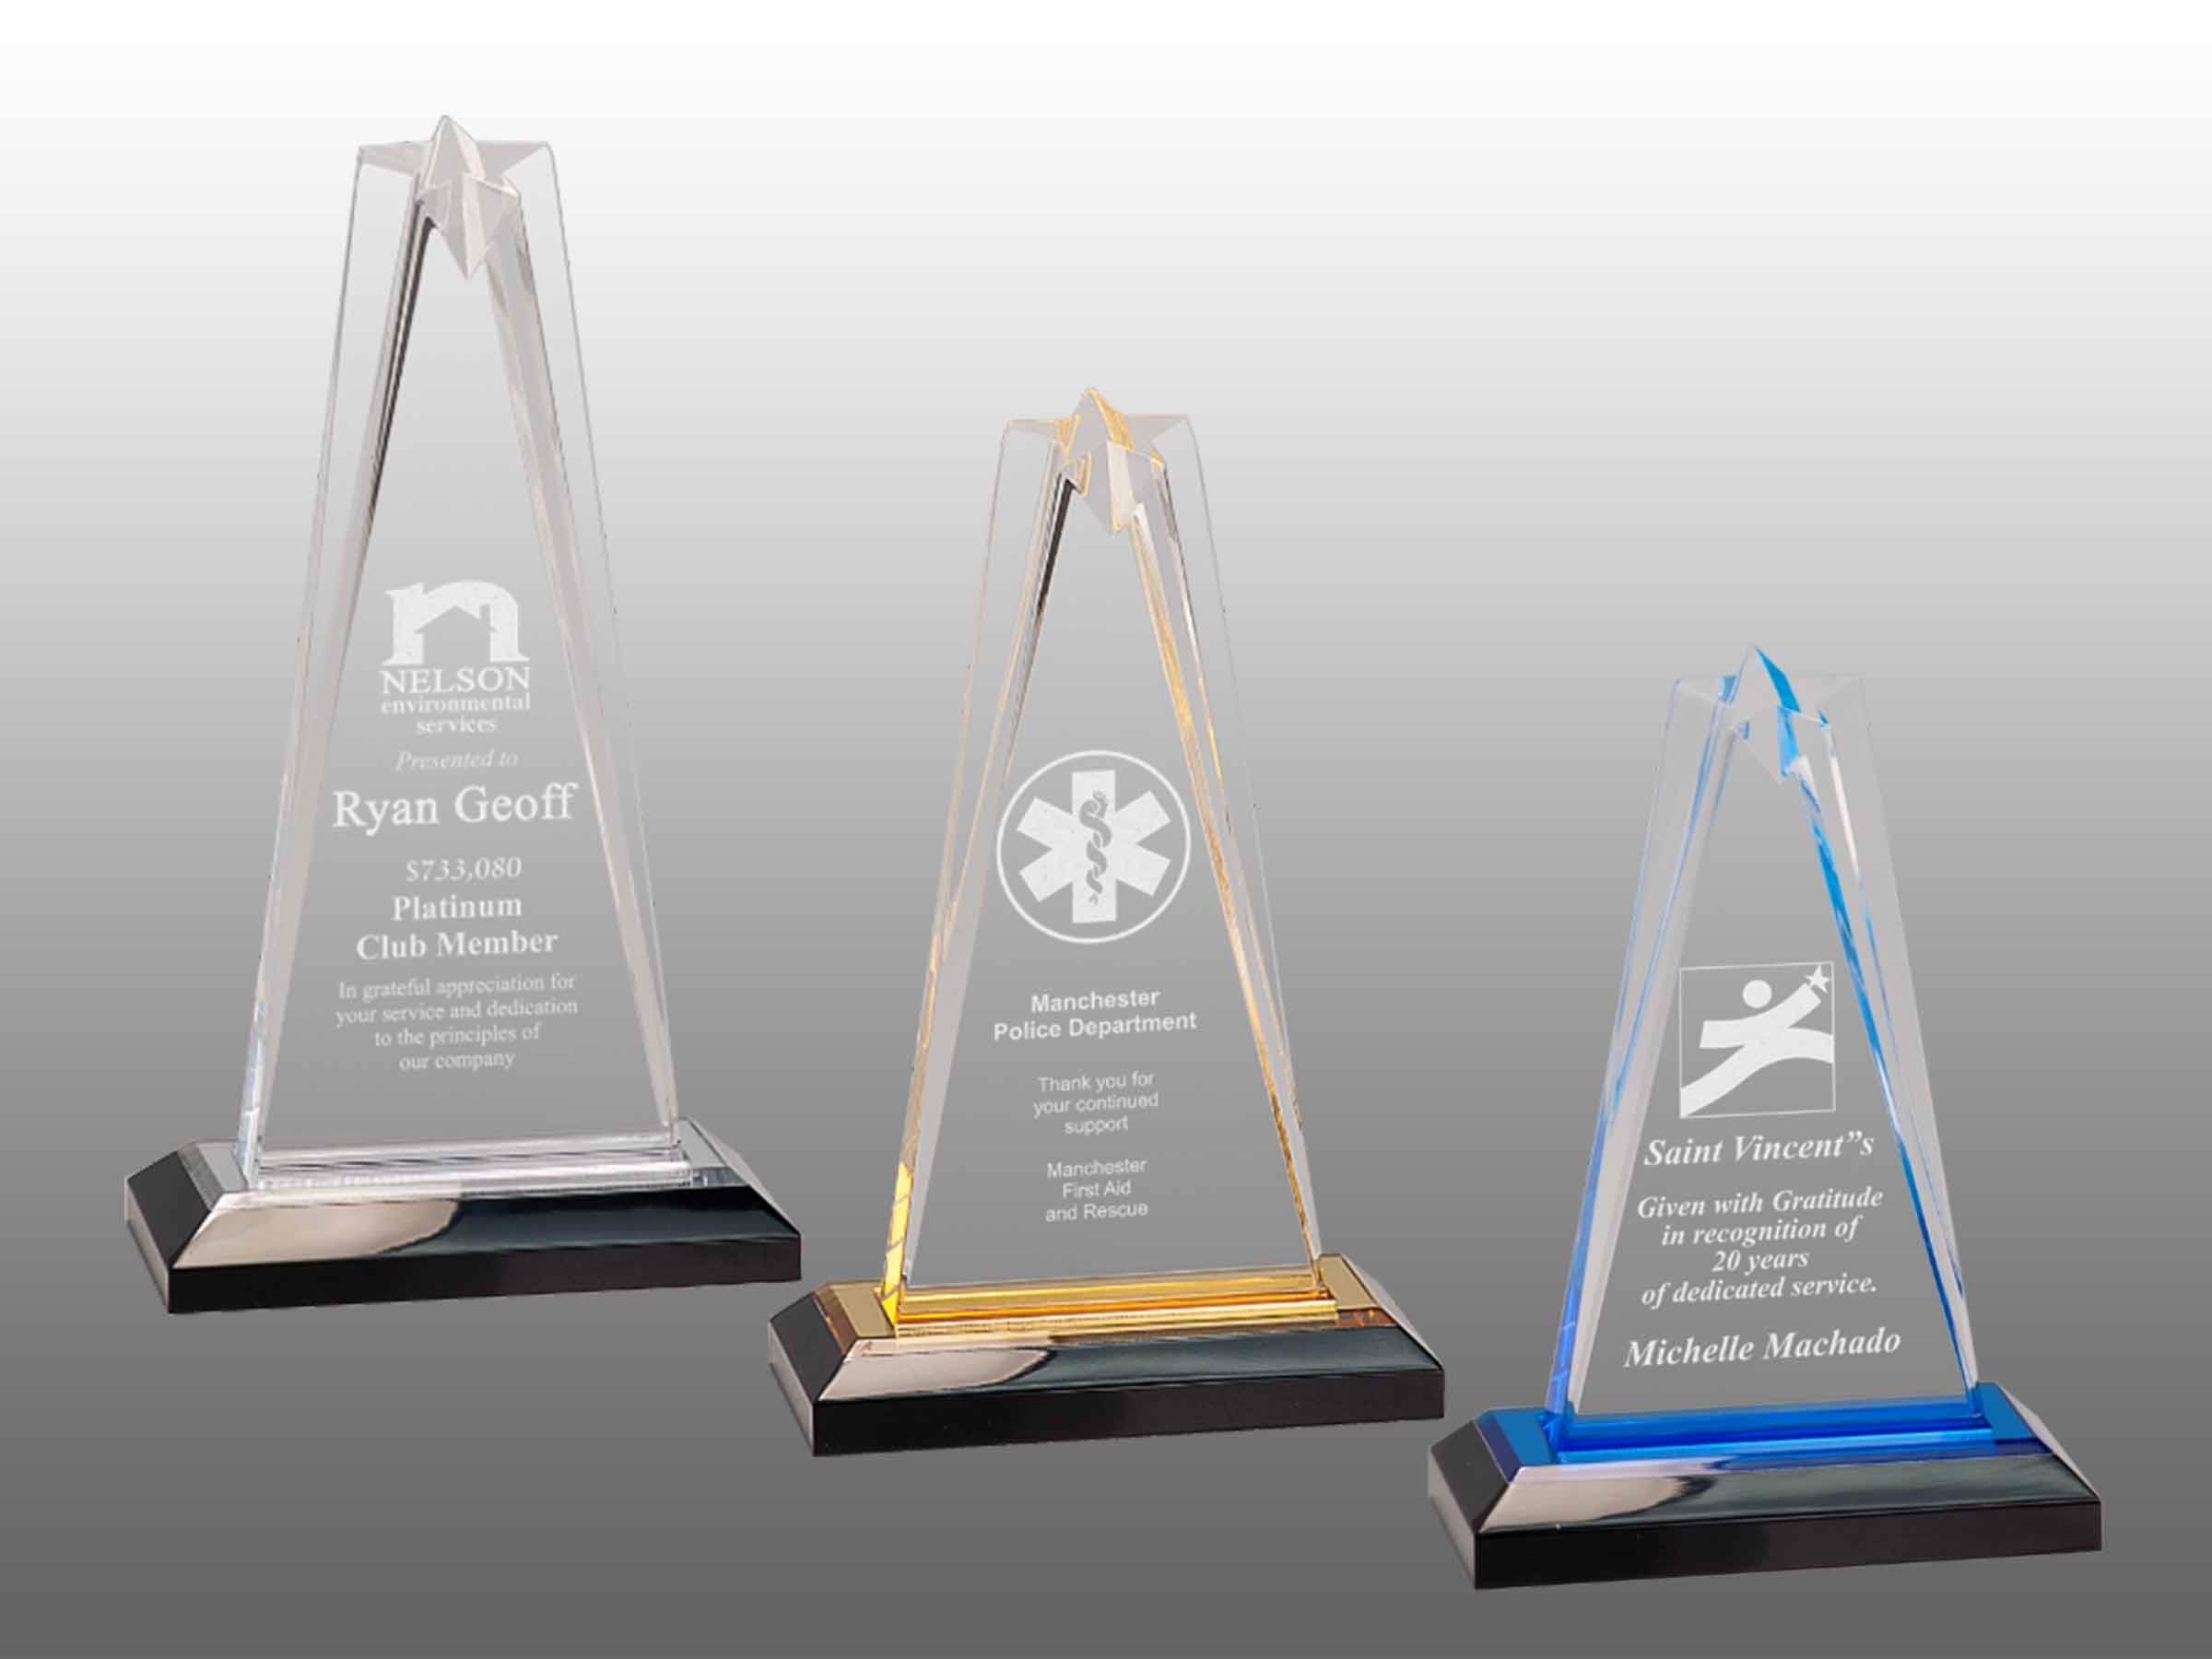 Star Impress Acrylic 6 Yukon Trophy